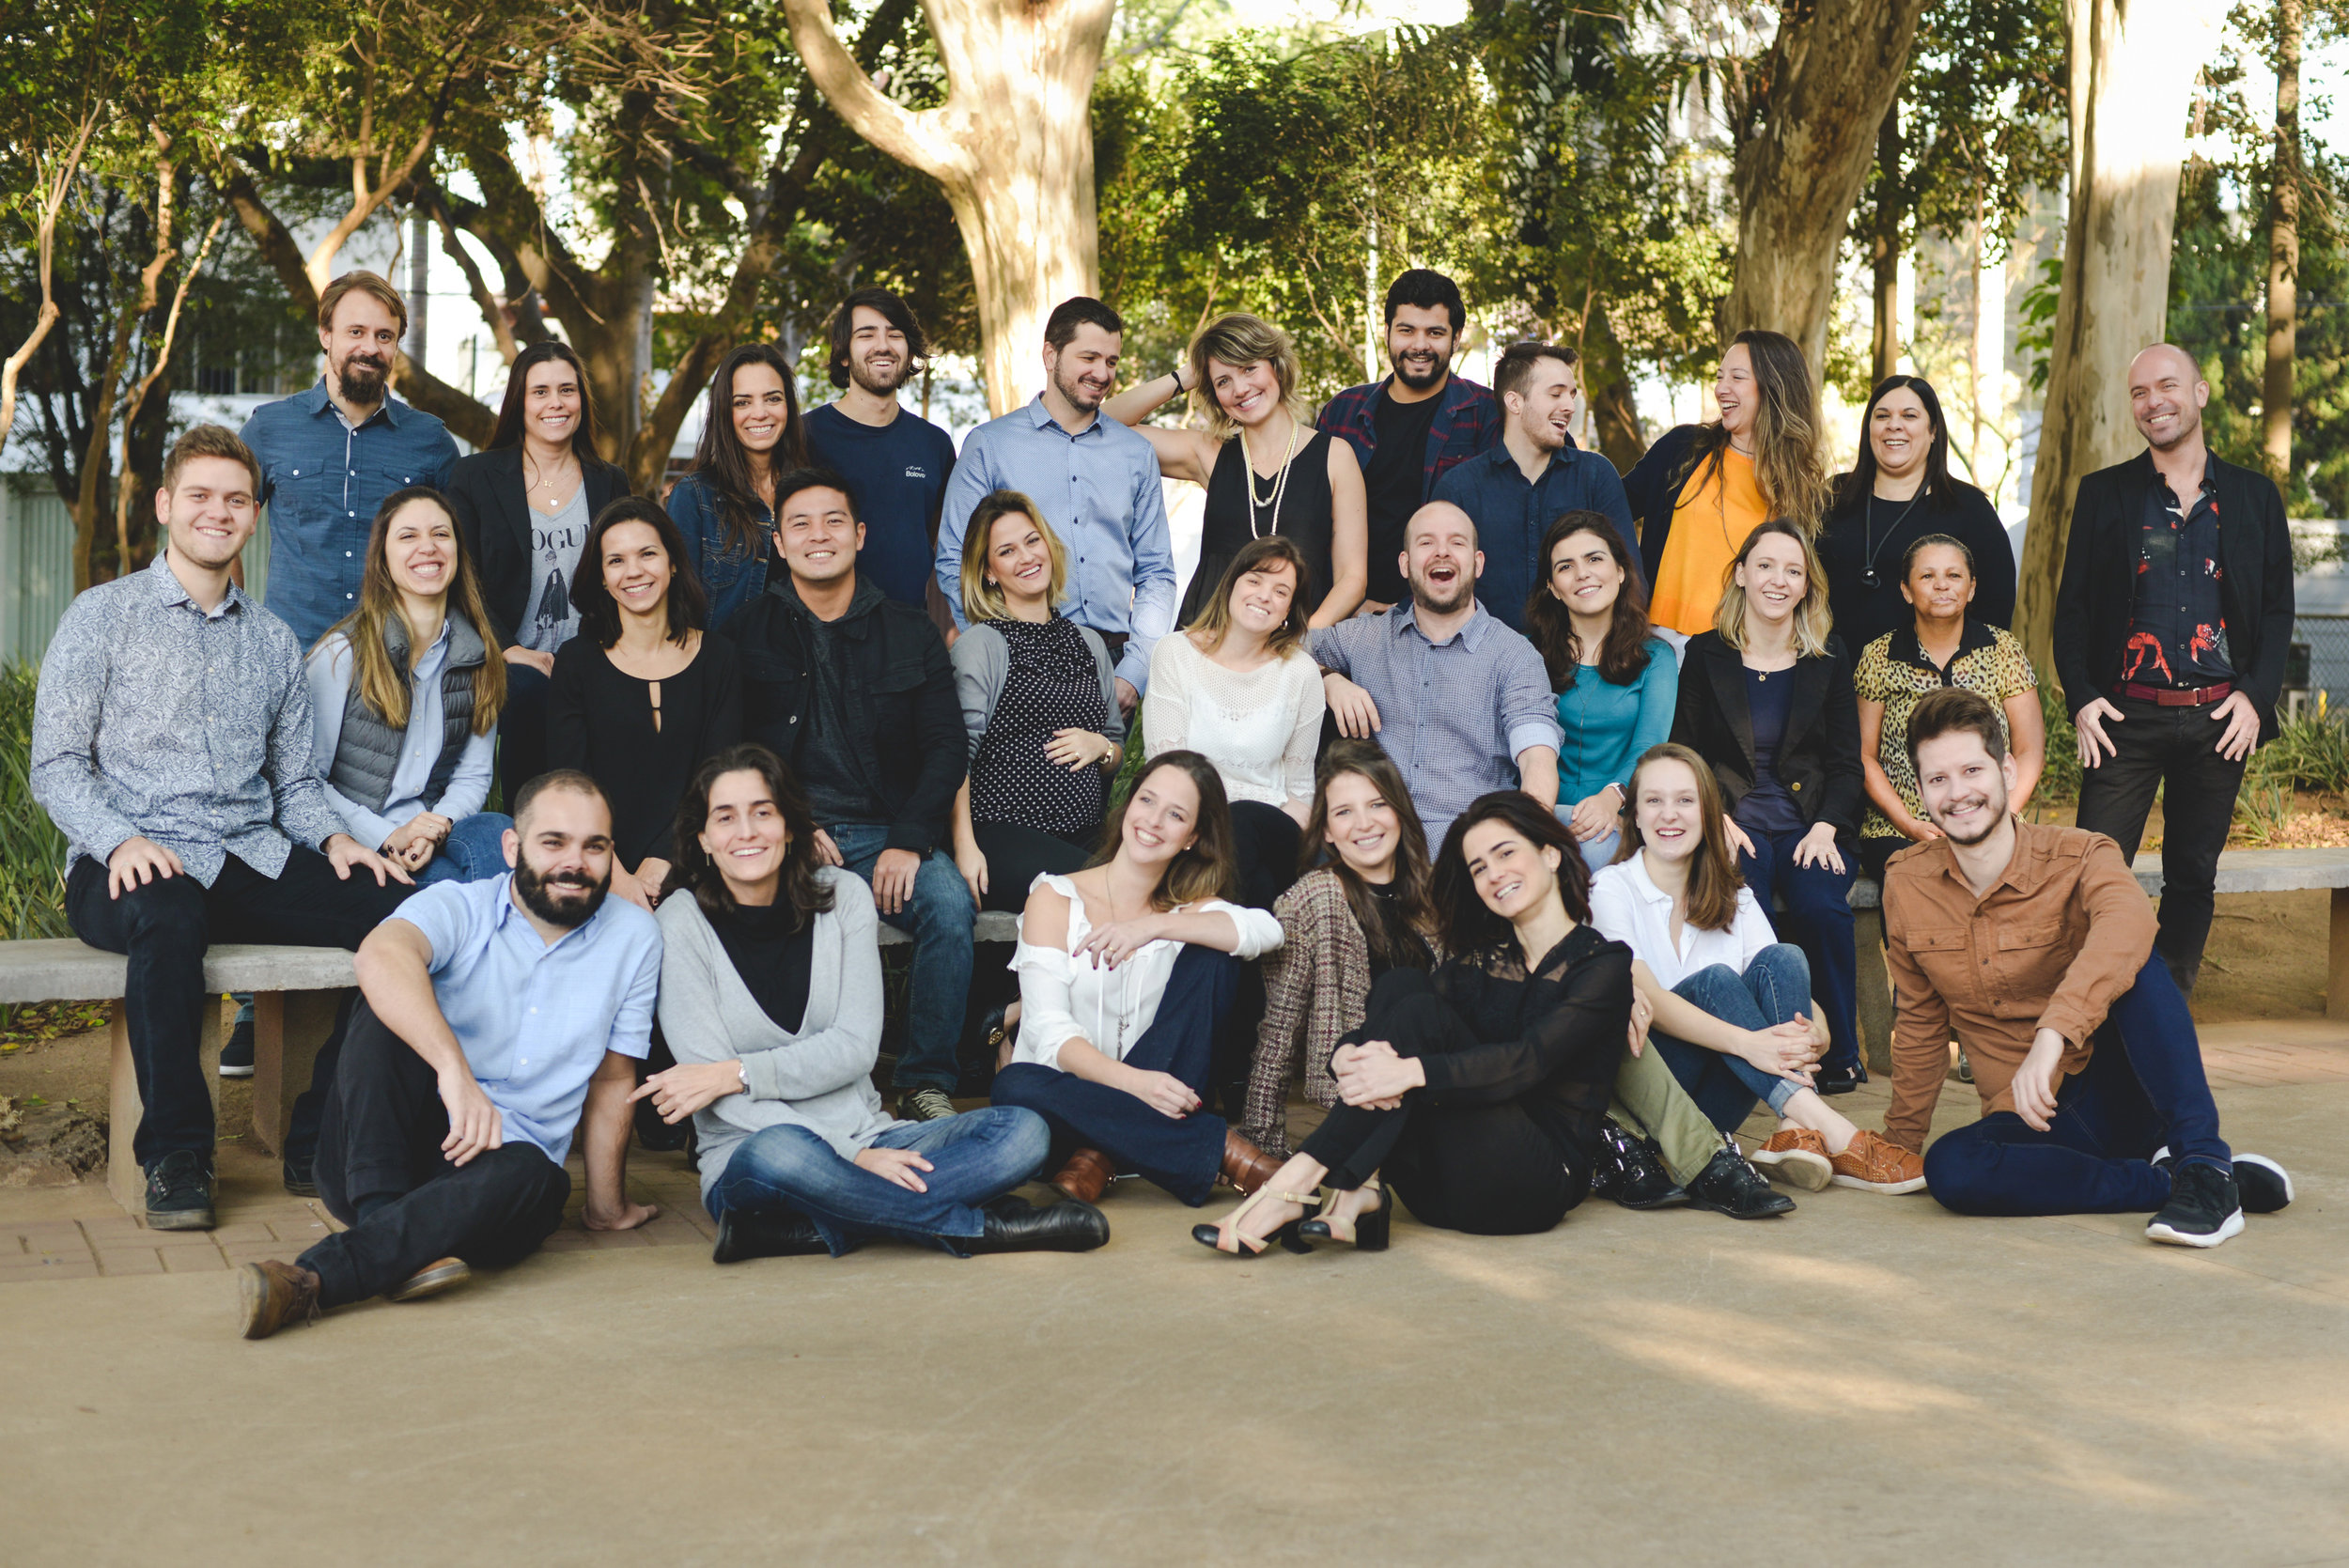 pita-pessoas-gptw-great-place-to-work.jpg